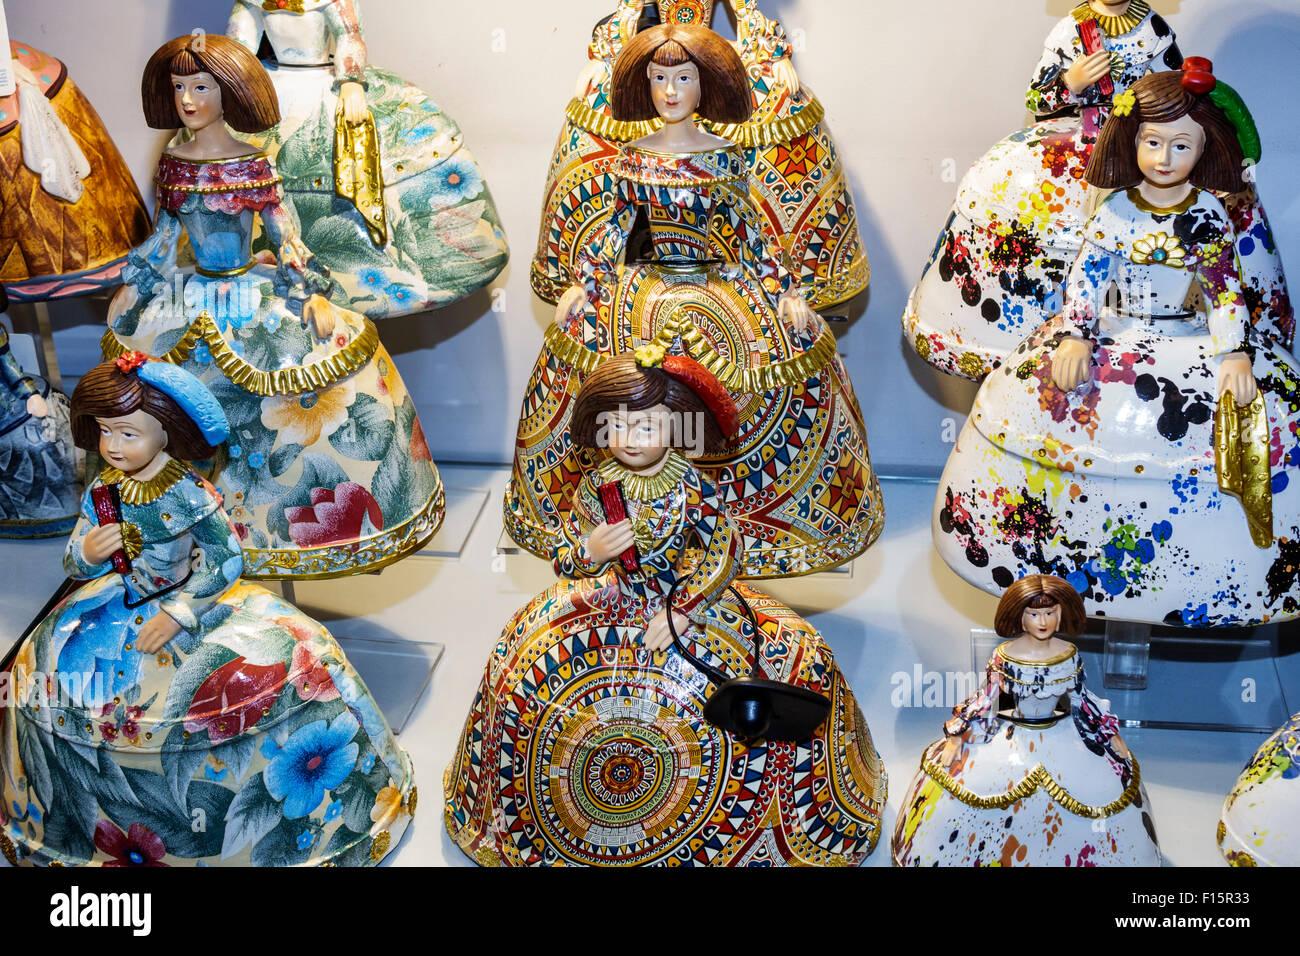 Madrid Spain Europe Spanish Centro Retiro Paseo del Prado store Objetos de Arte Toledano gift shop souvenirs shopping Stock Photo